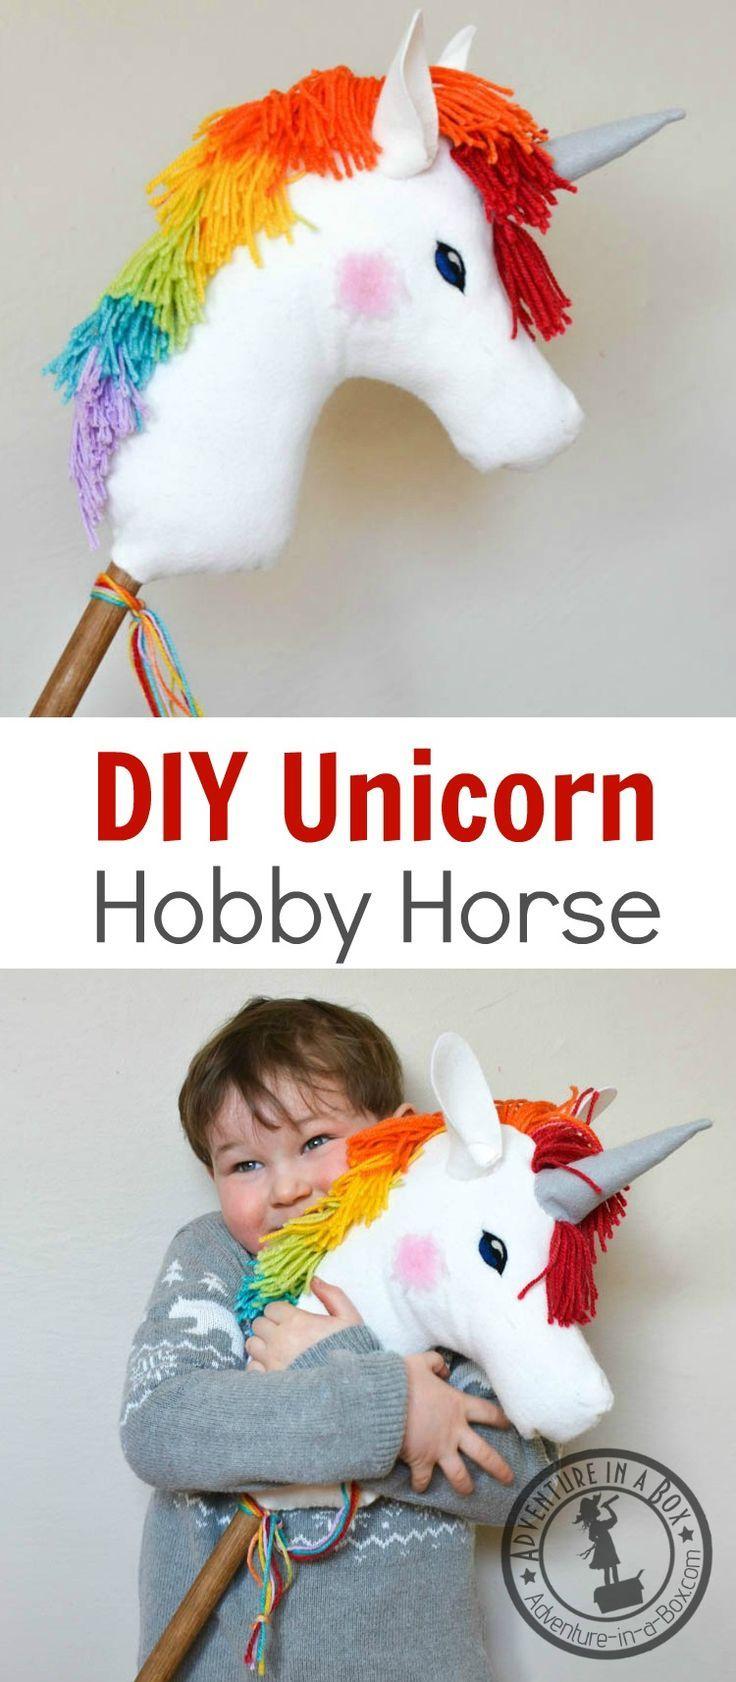 DIY Rainbow Unicorn Hobby Horse